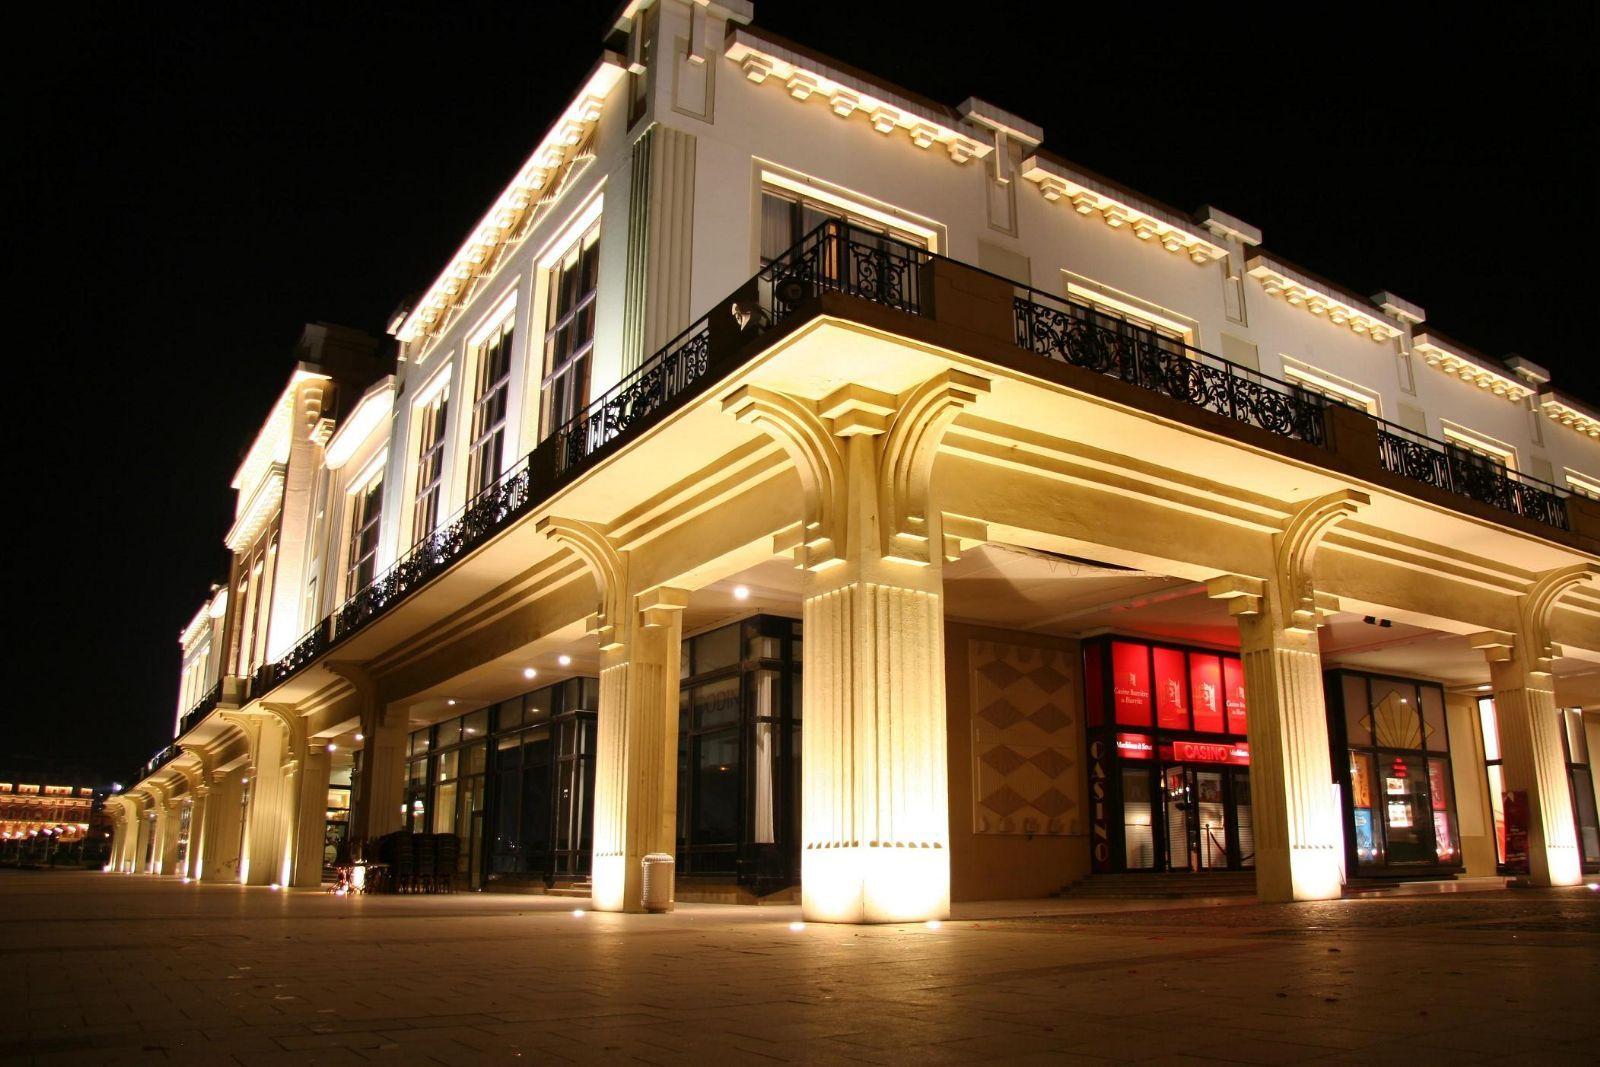 Hotel casino barriere biarritz armoire penderie sur roulettes